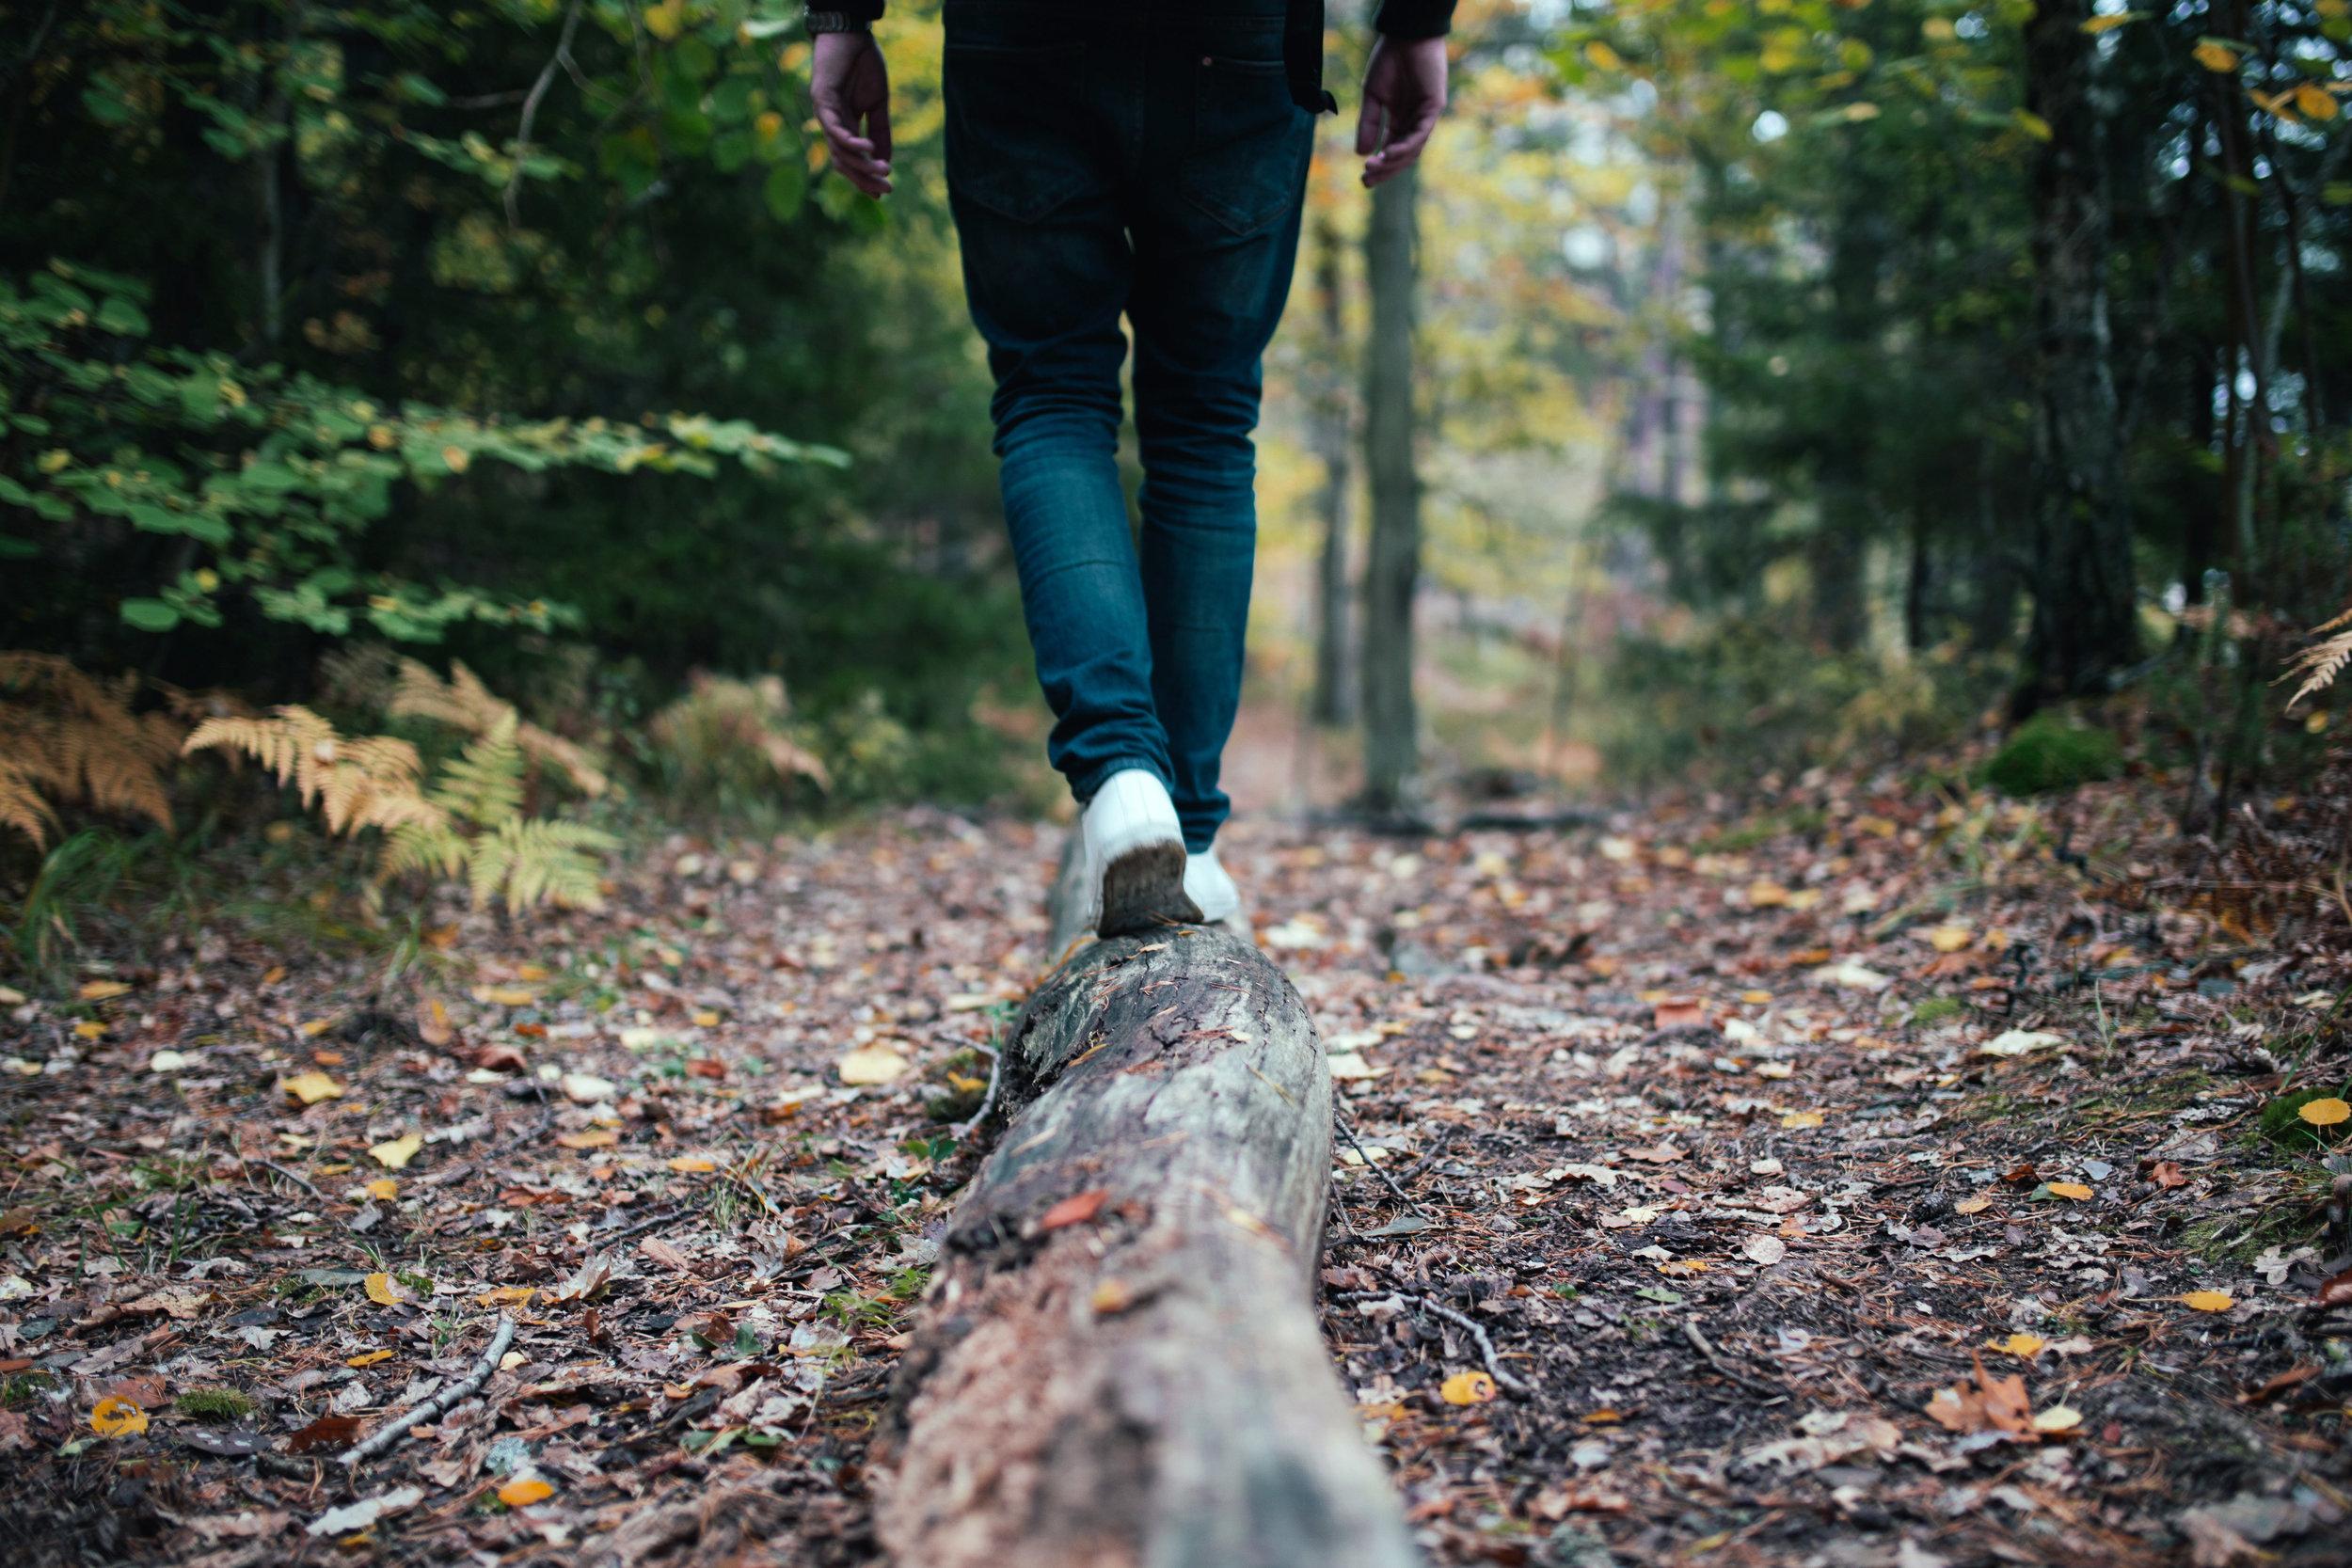 Legs of person walking along a fallen log on wooded trail